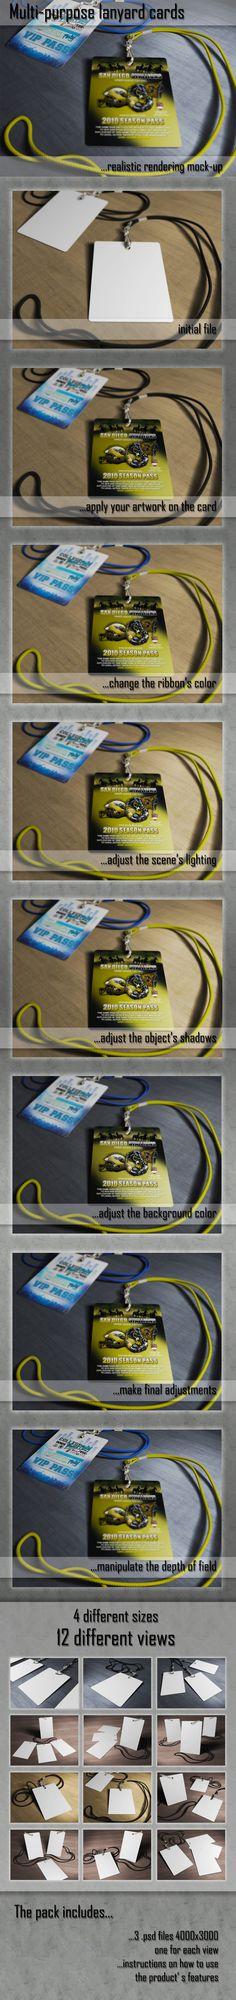 Multipurpose Hanging Card Mockup (FREE SAMPLE) by ~TeoNikif on deviantART